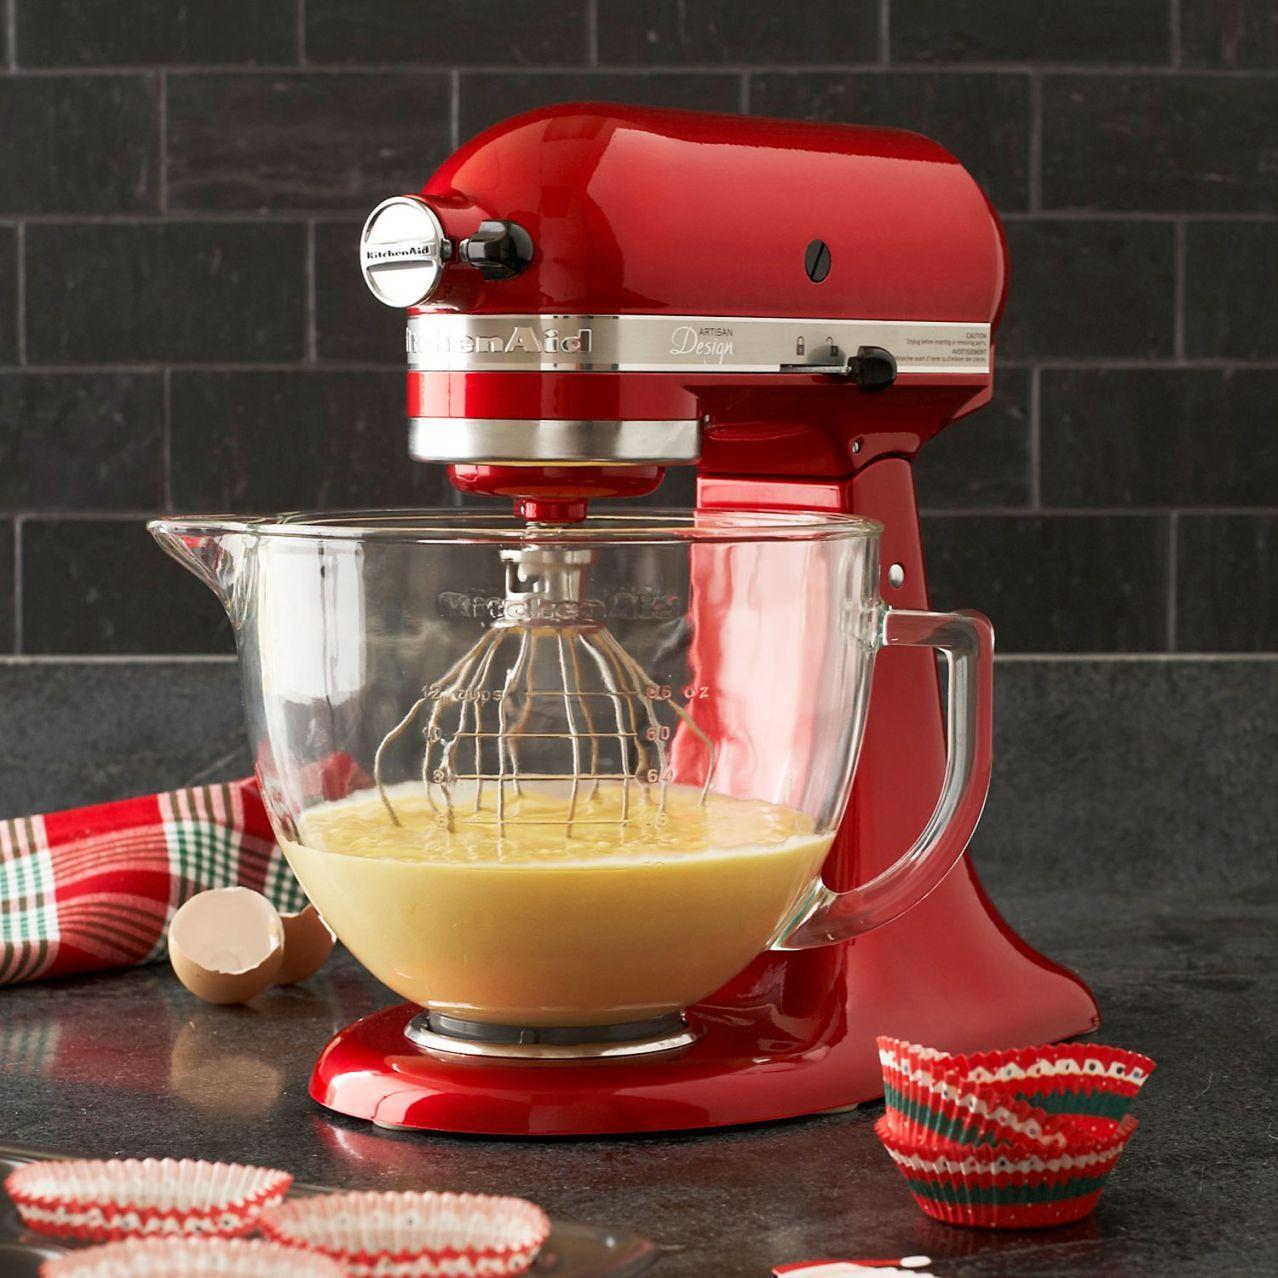 Quick Trip Kitchens: KitchenAid® Artisan® Design Series Stand Mixer, 5 Qt